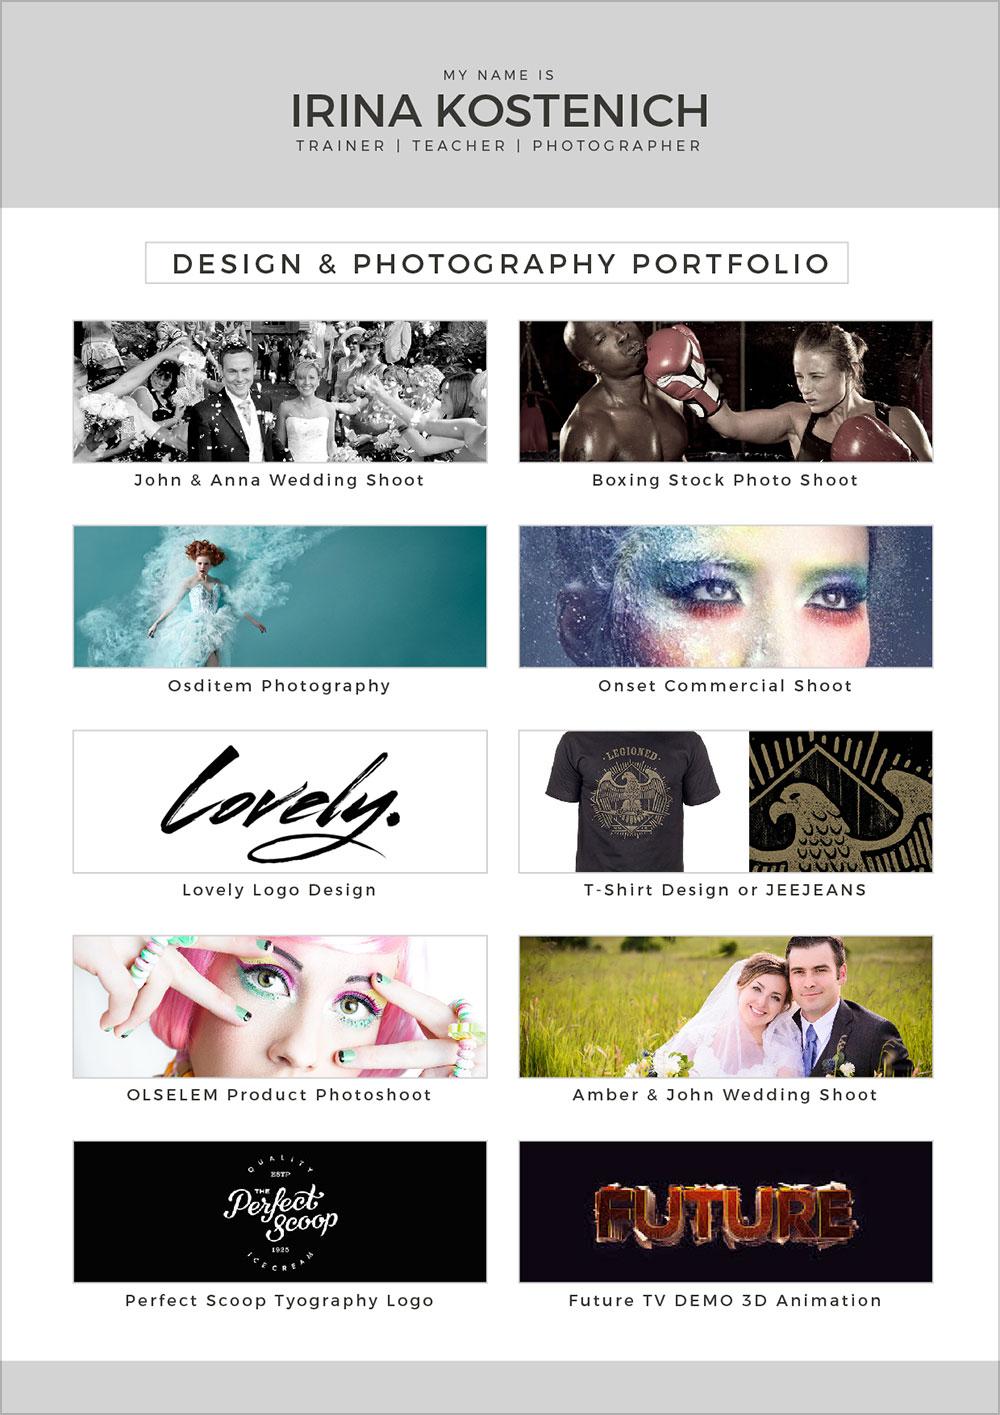 Free-Modern-CV Portfolio-Design Template-in-Vector-Ai-Format